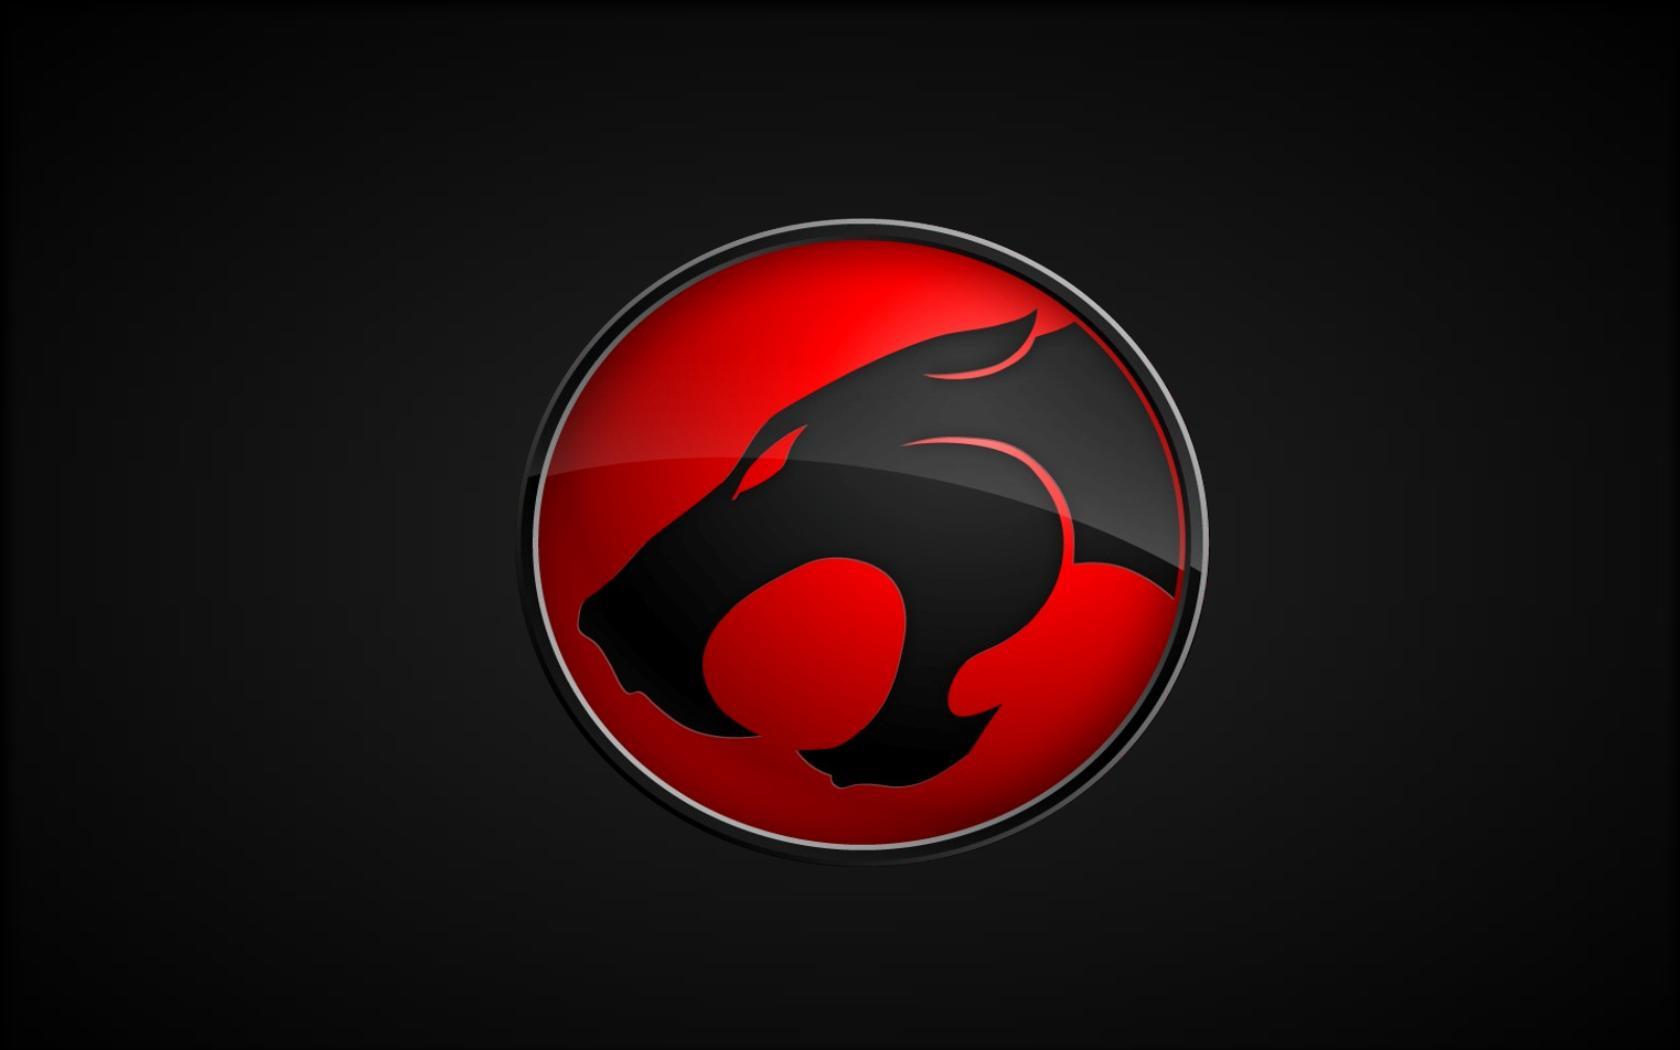 Thundercats Logo Wallpapers Wallpaper Cave